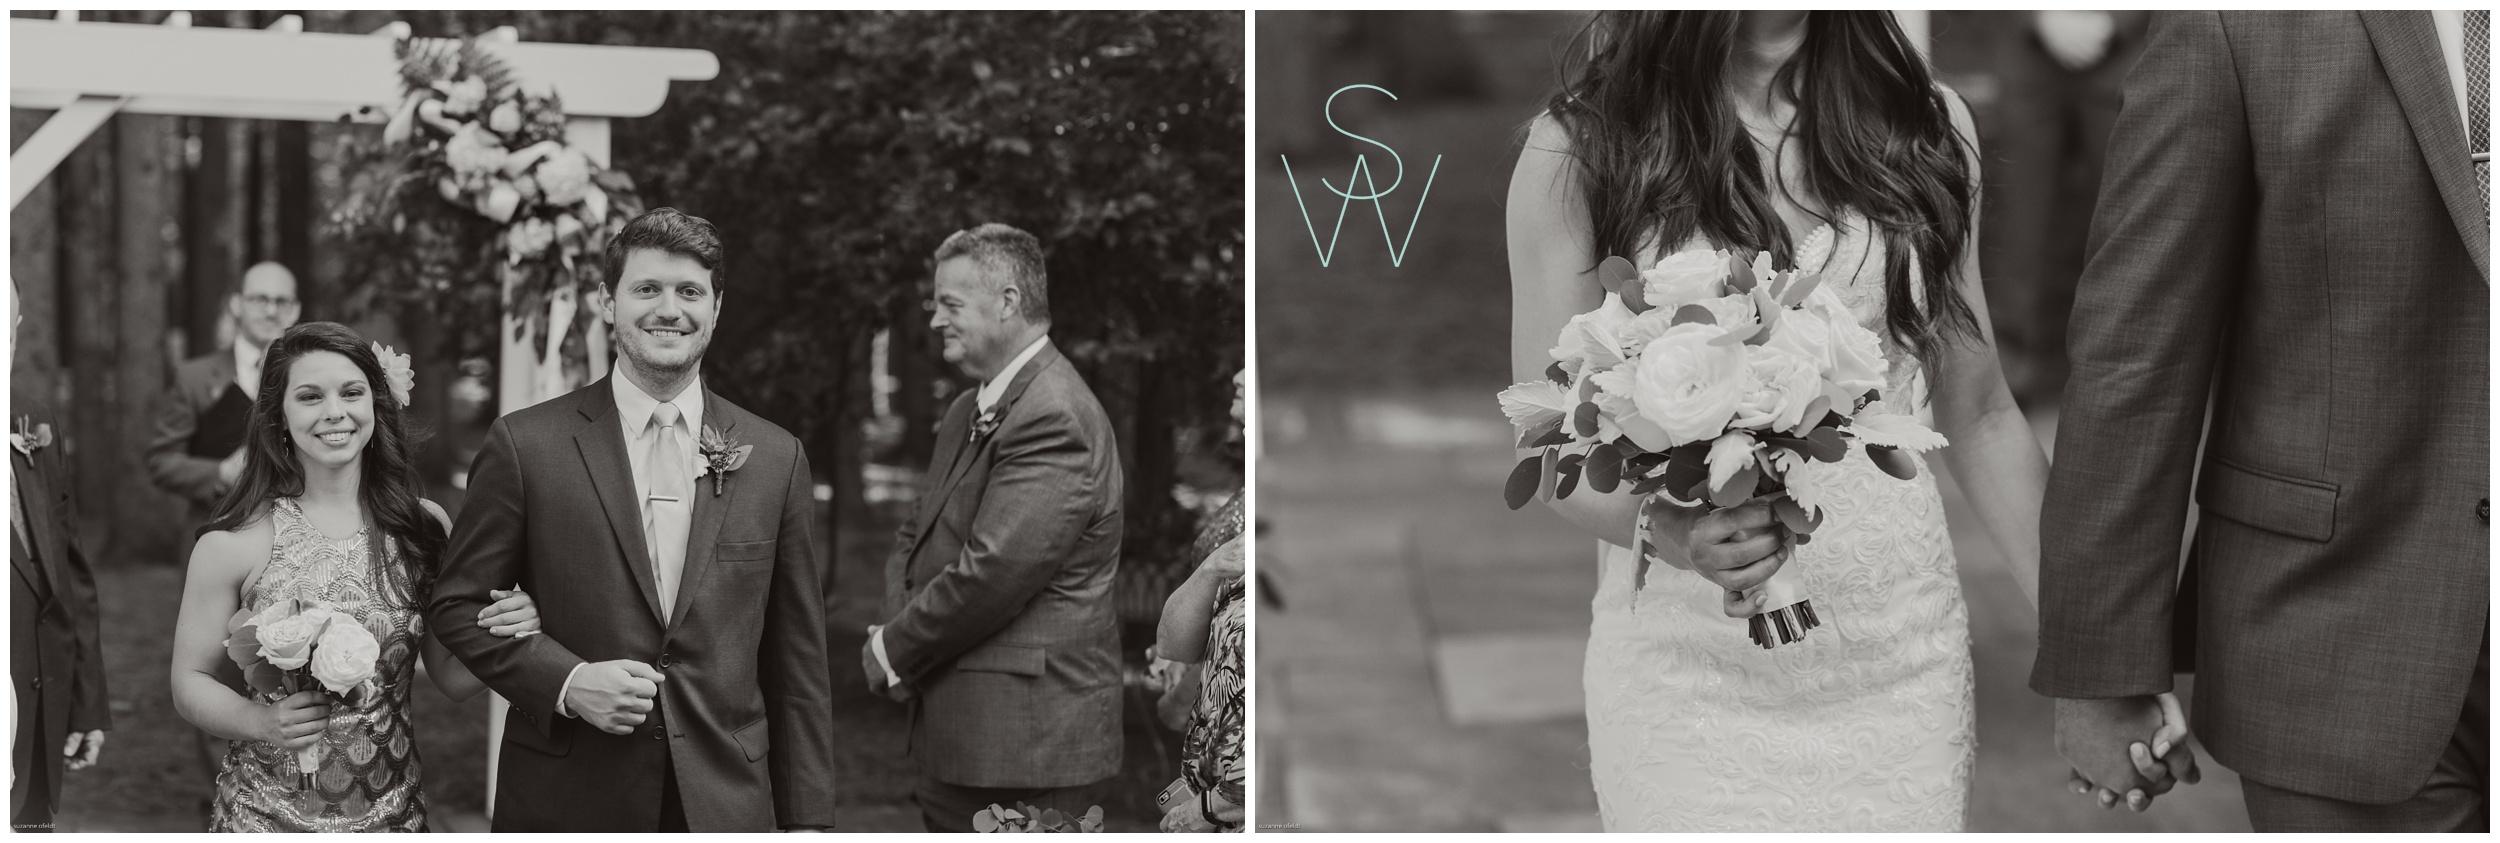 san.diego.wedding.photography_0161.jpg